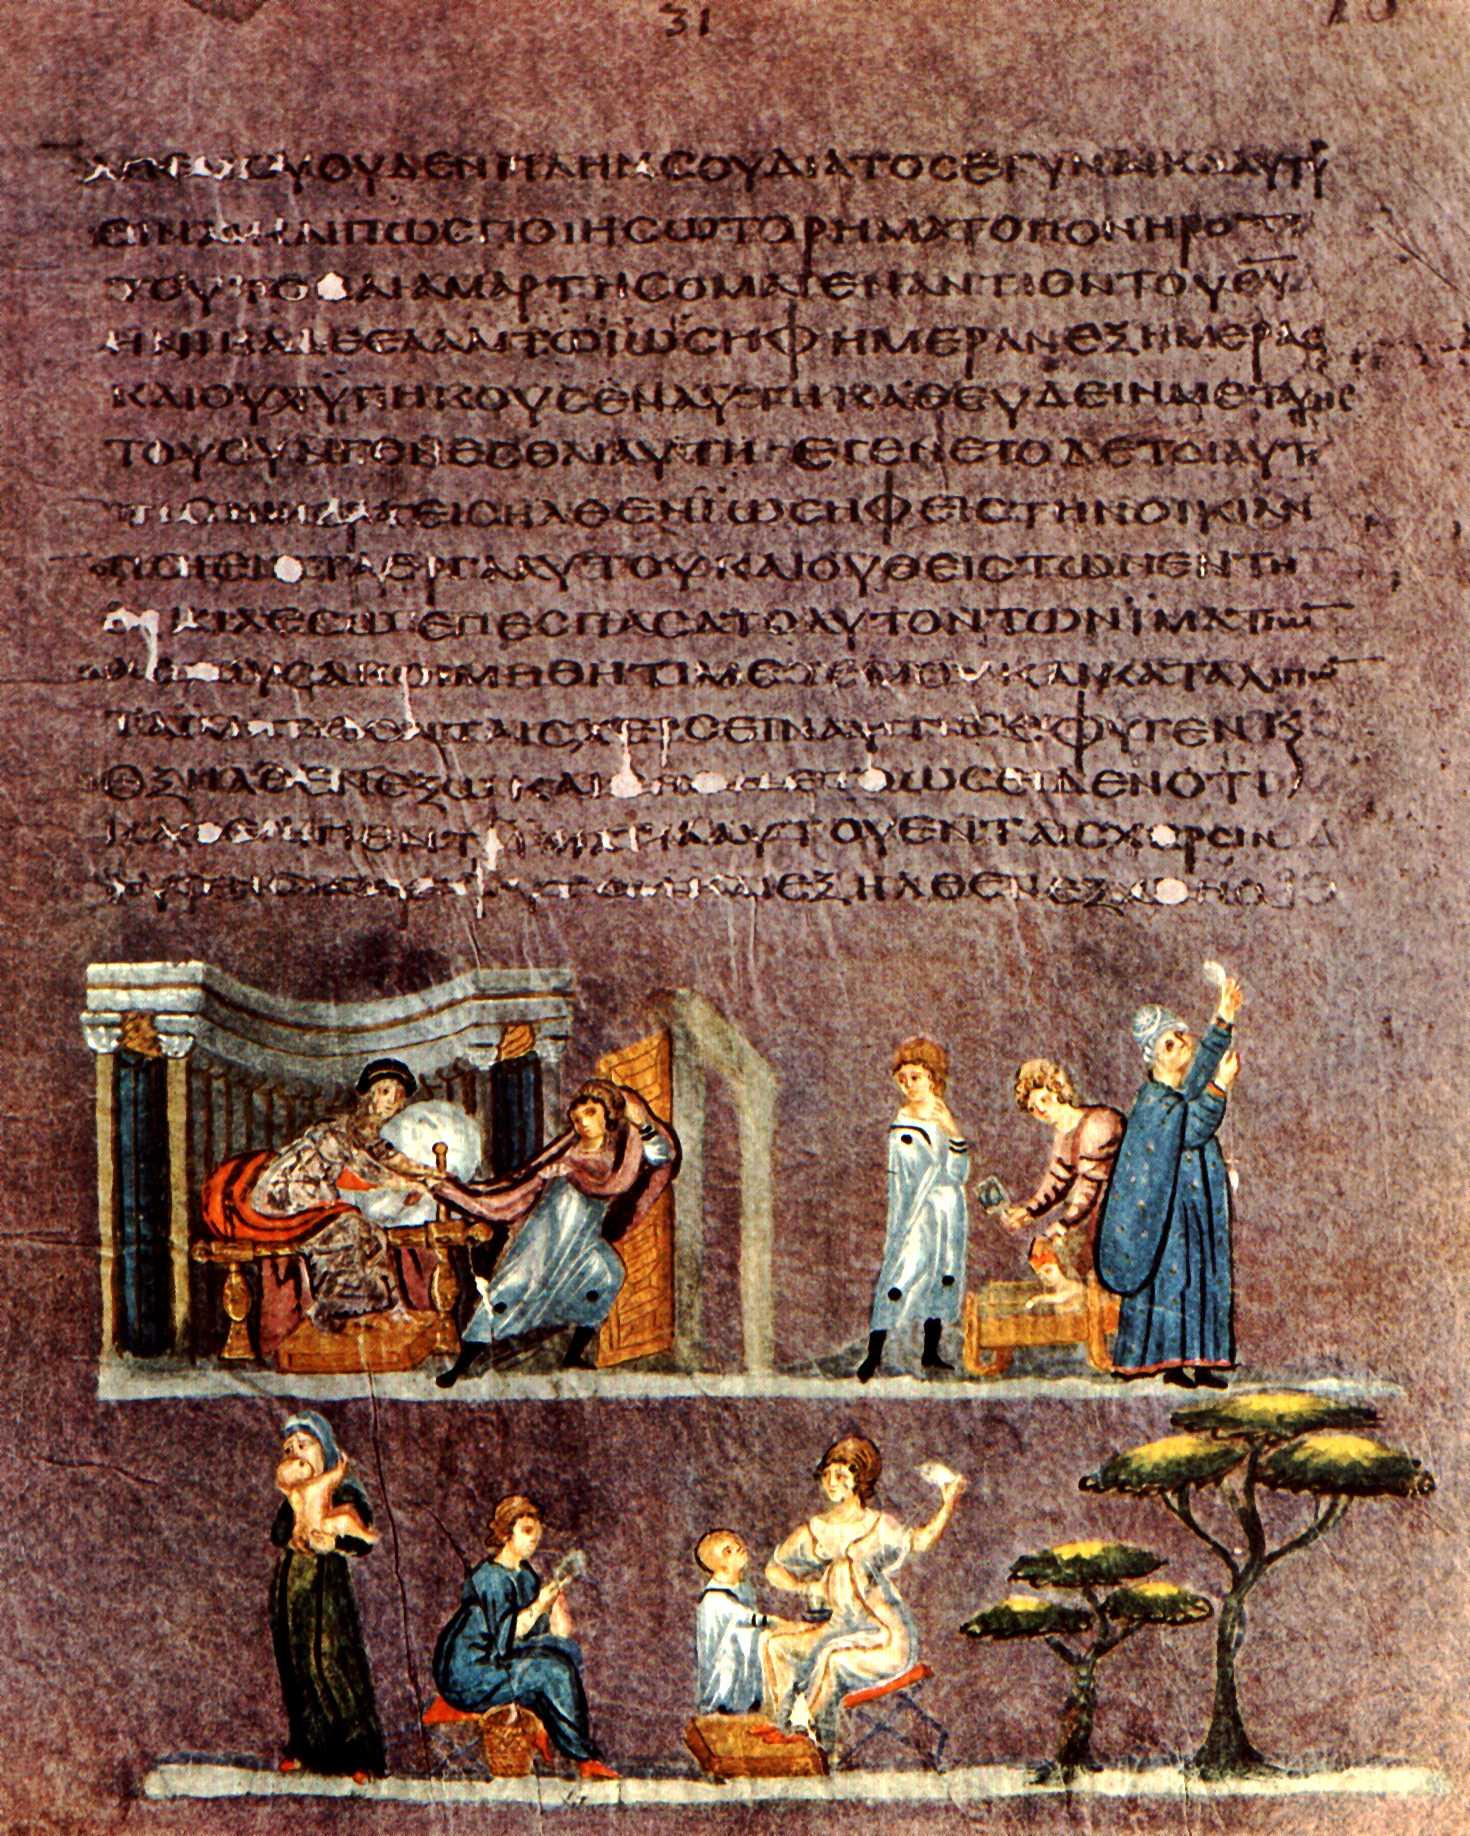 dating medieval manuscripts